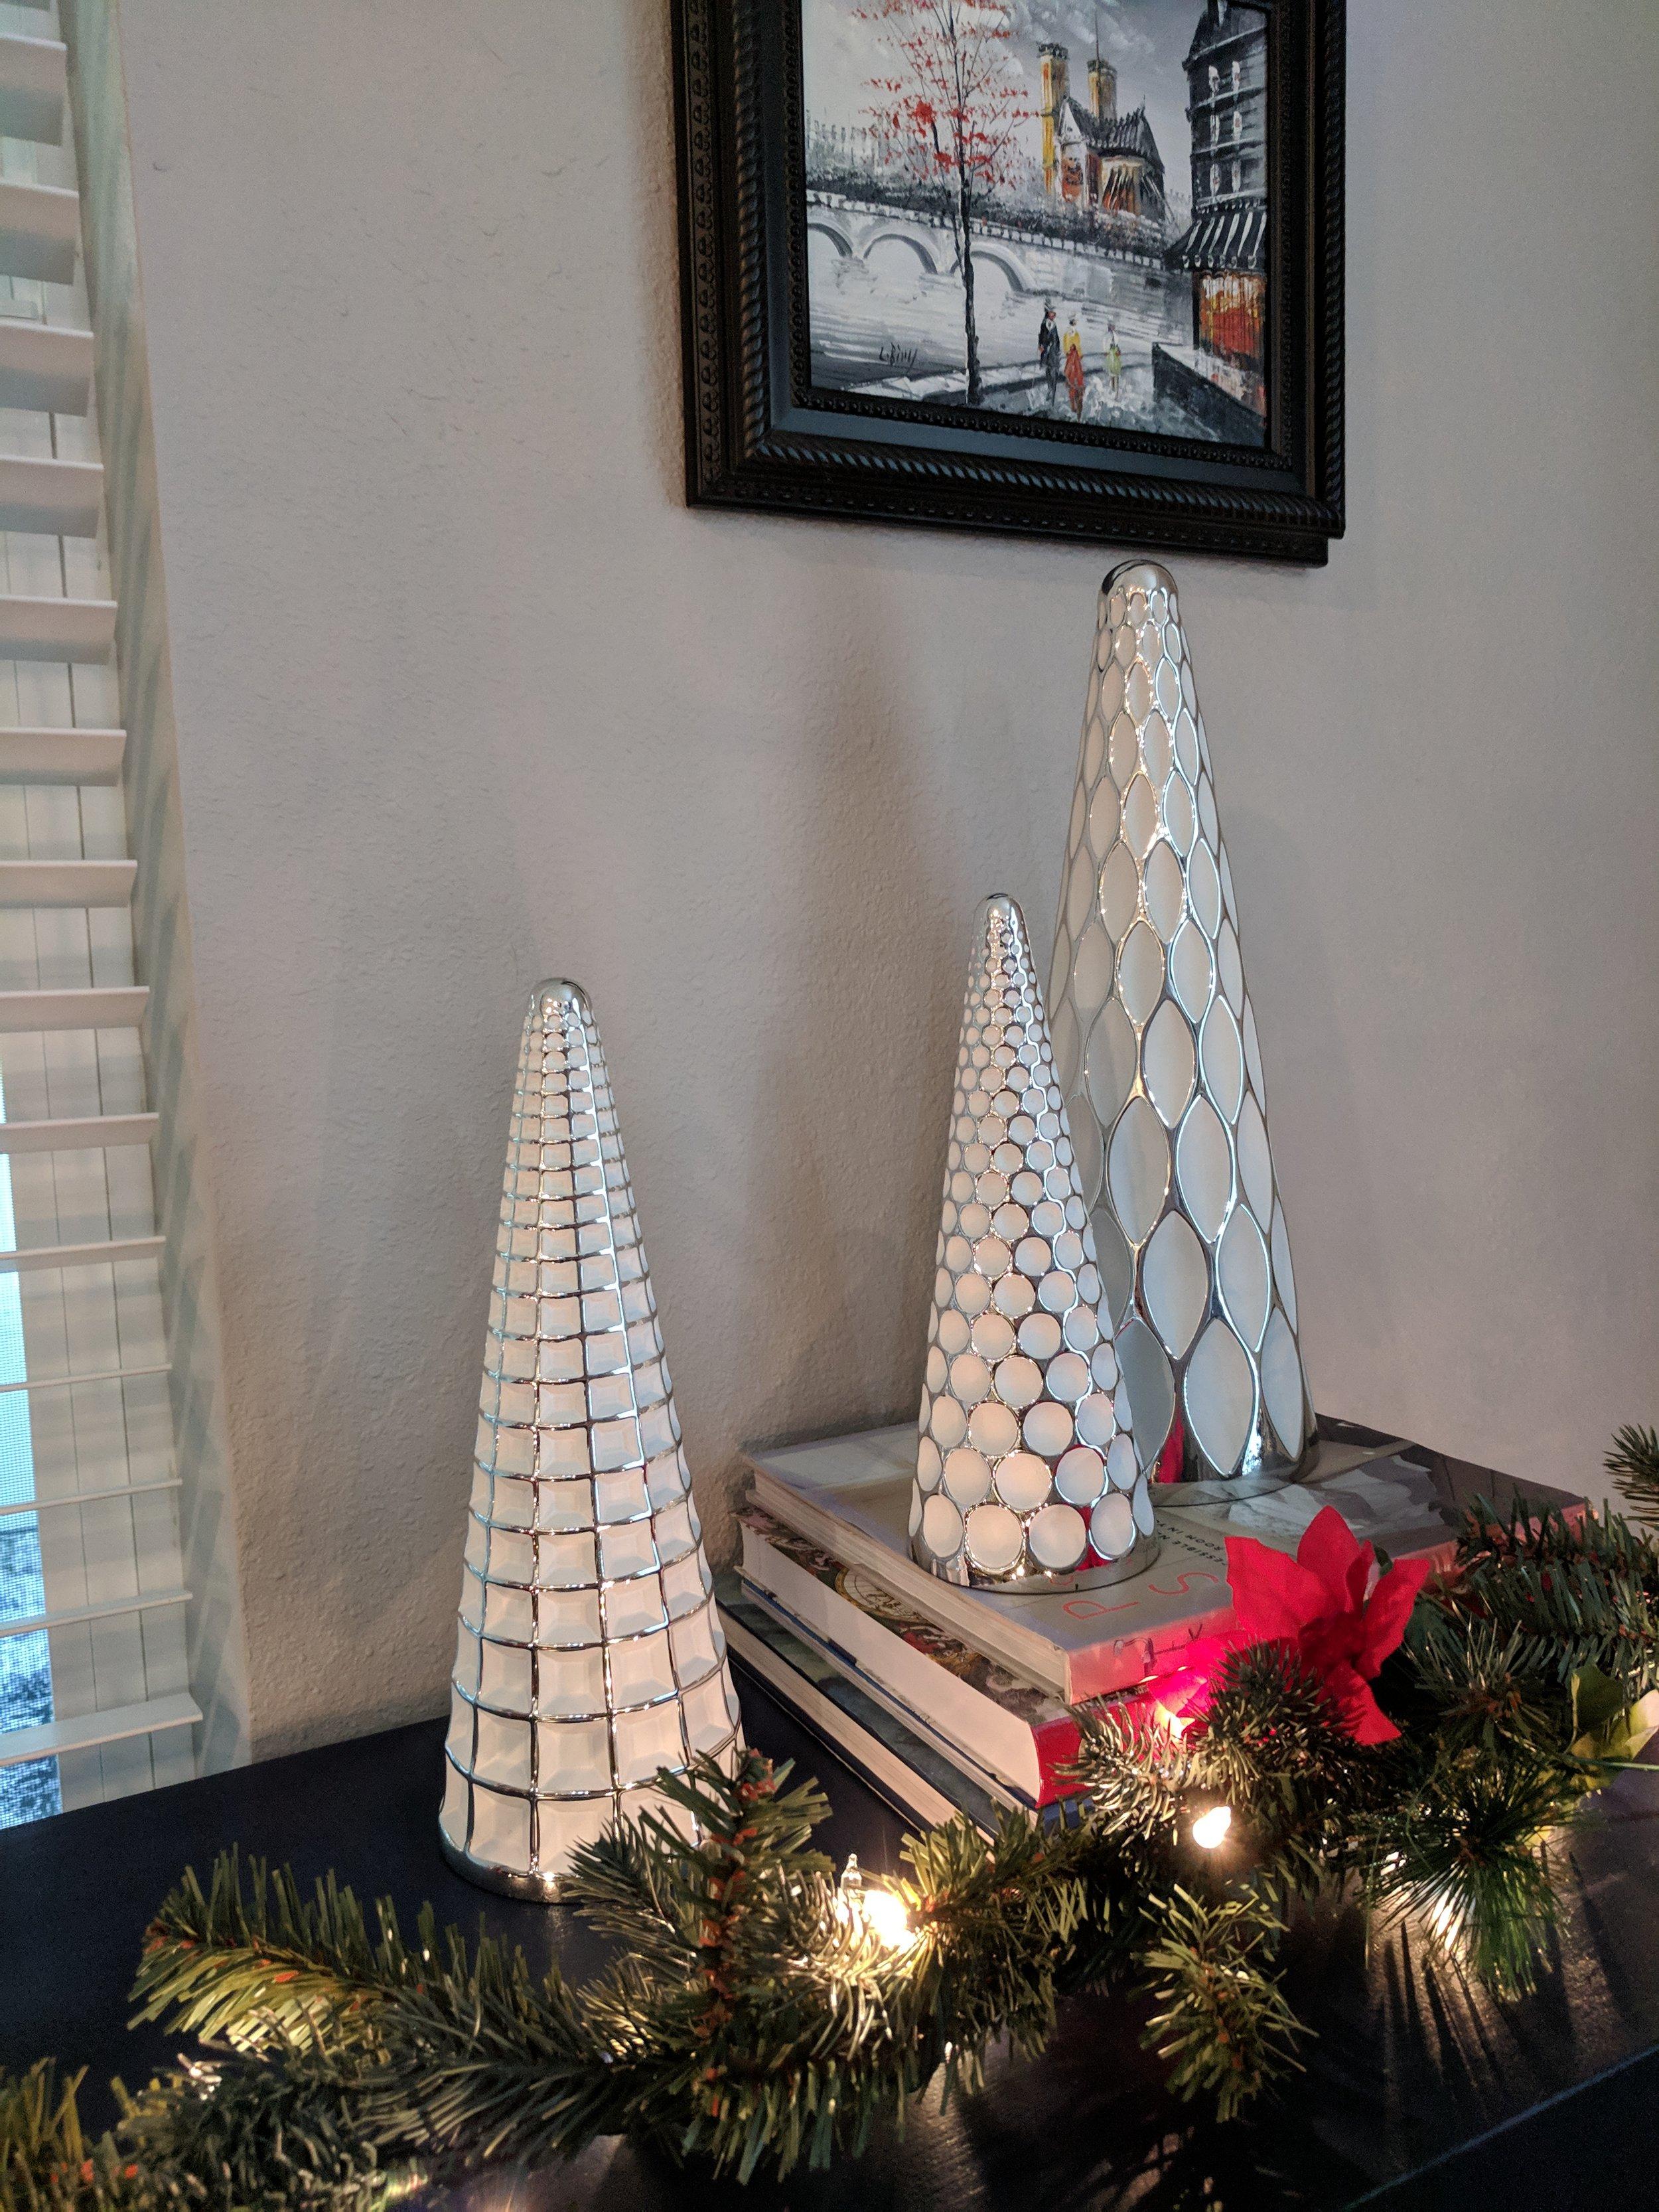 A white Christmas trees